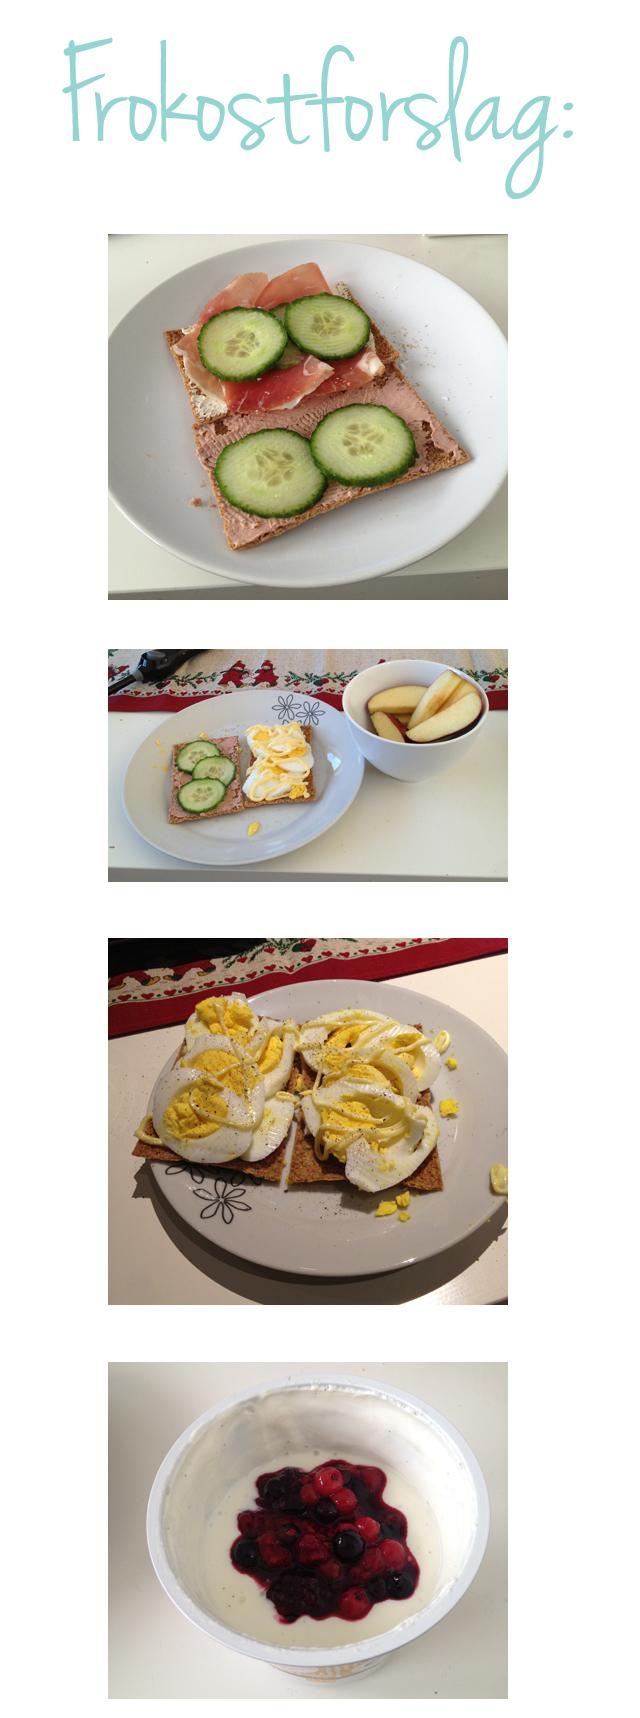 frokostforslag